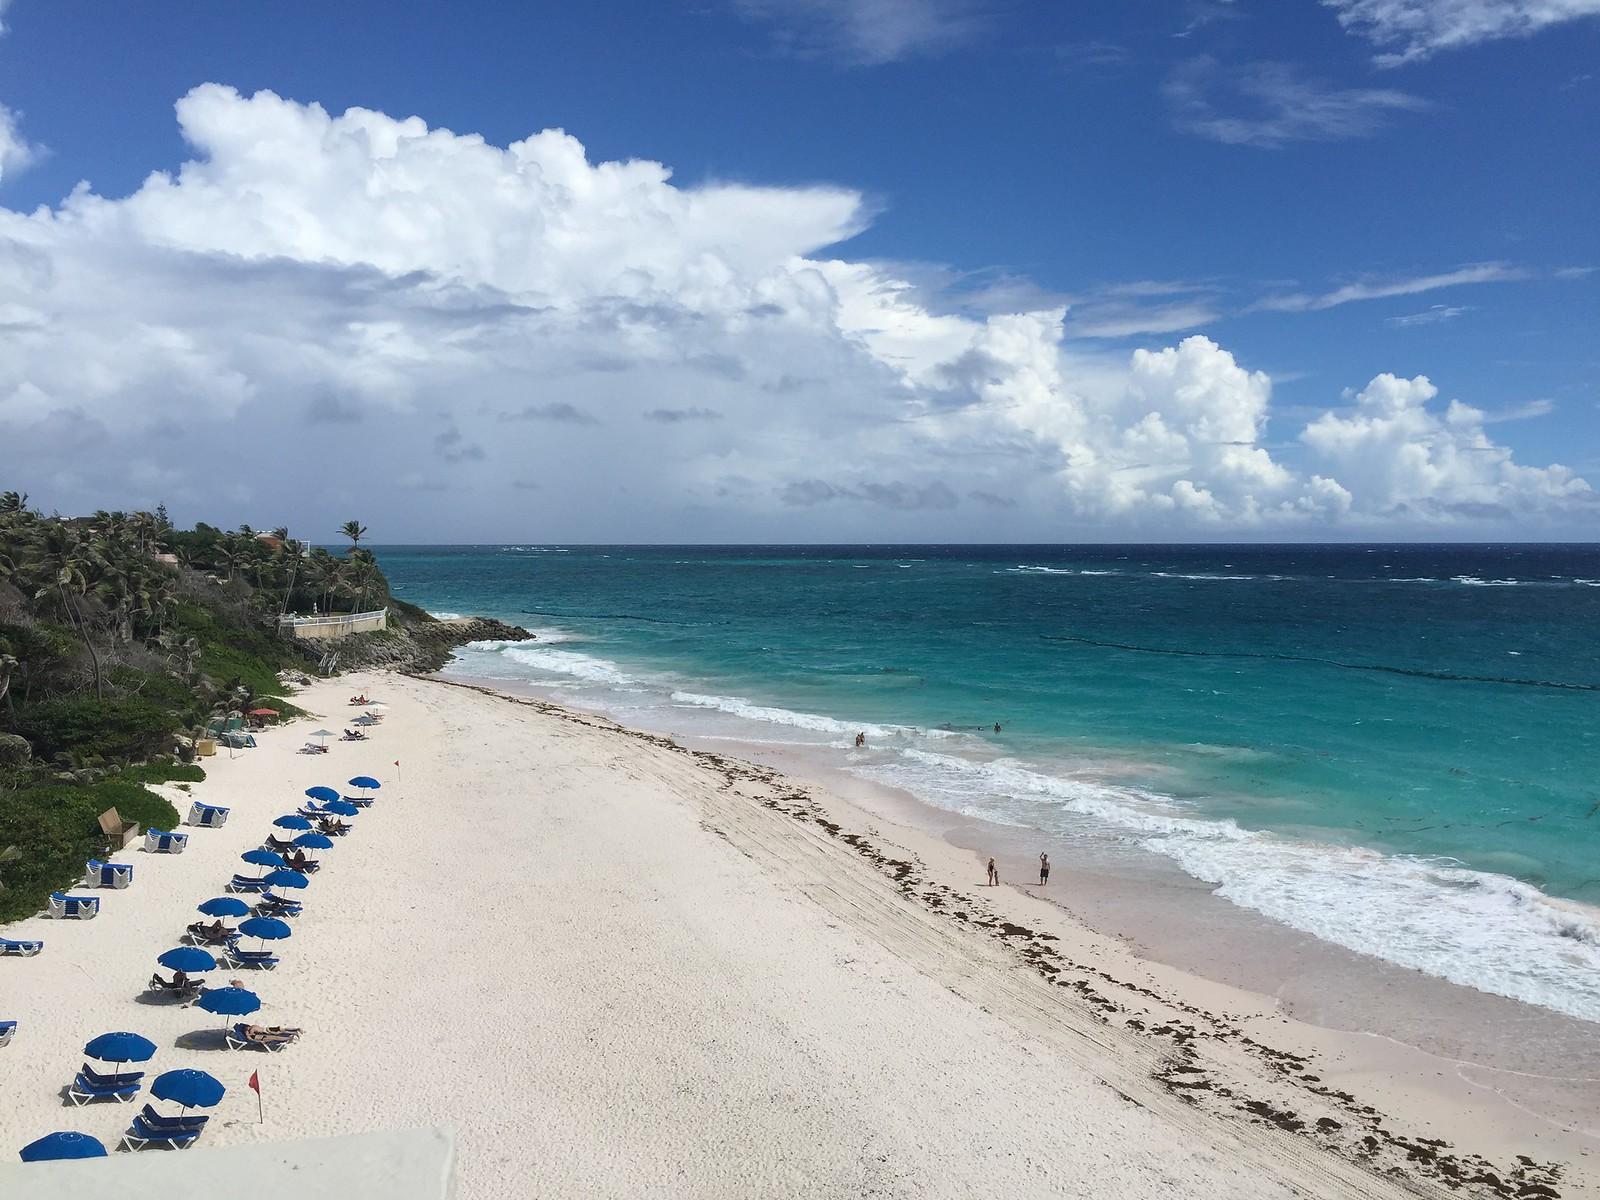 The Crane Hotel Beach, Barbados